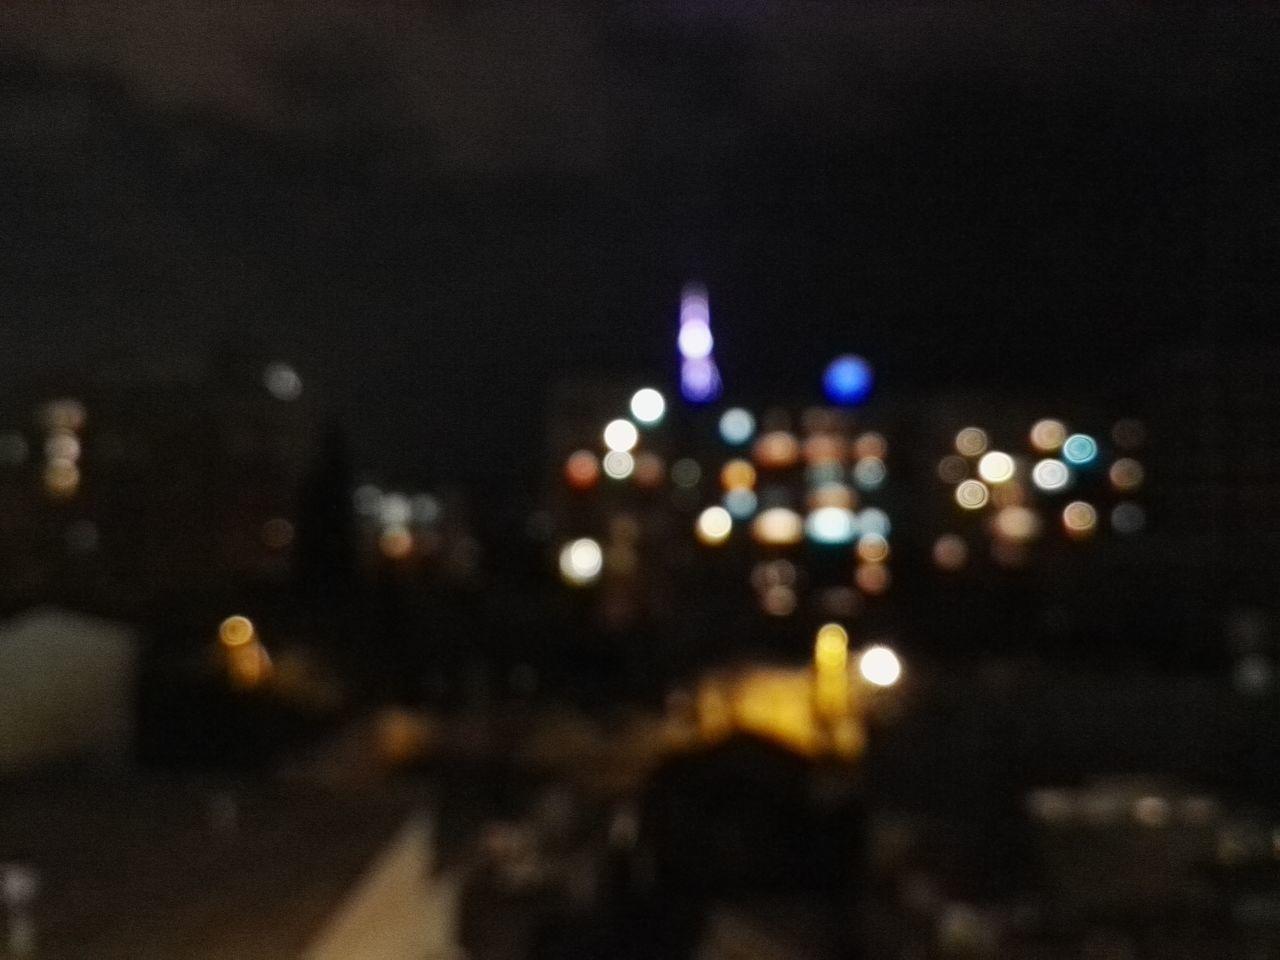 My lovely City HuaweiP8 My City My City Is Beautiful Night Night City Night Lights Nightlife Nightphotography Nonfocus P8nightworld საქართველო♥